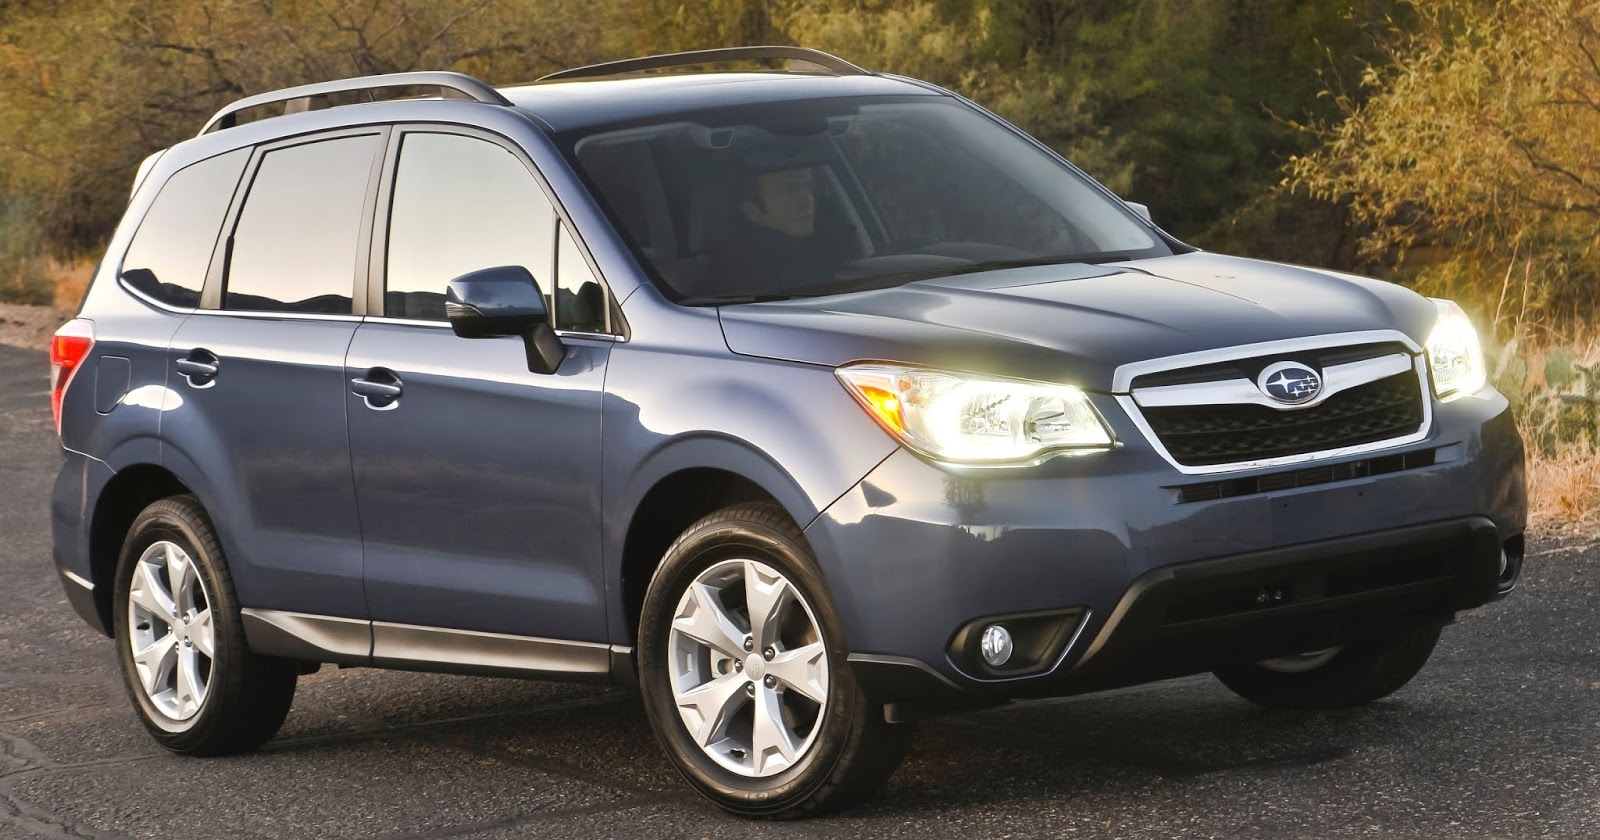 SUV Subaru Forester